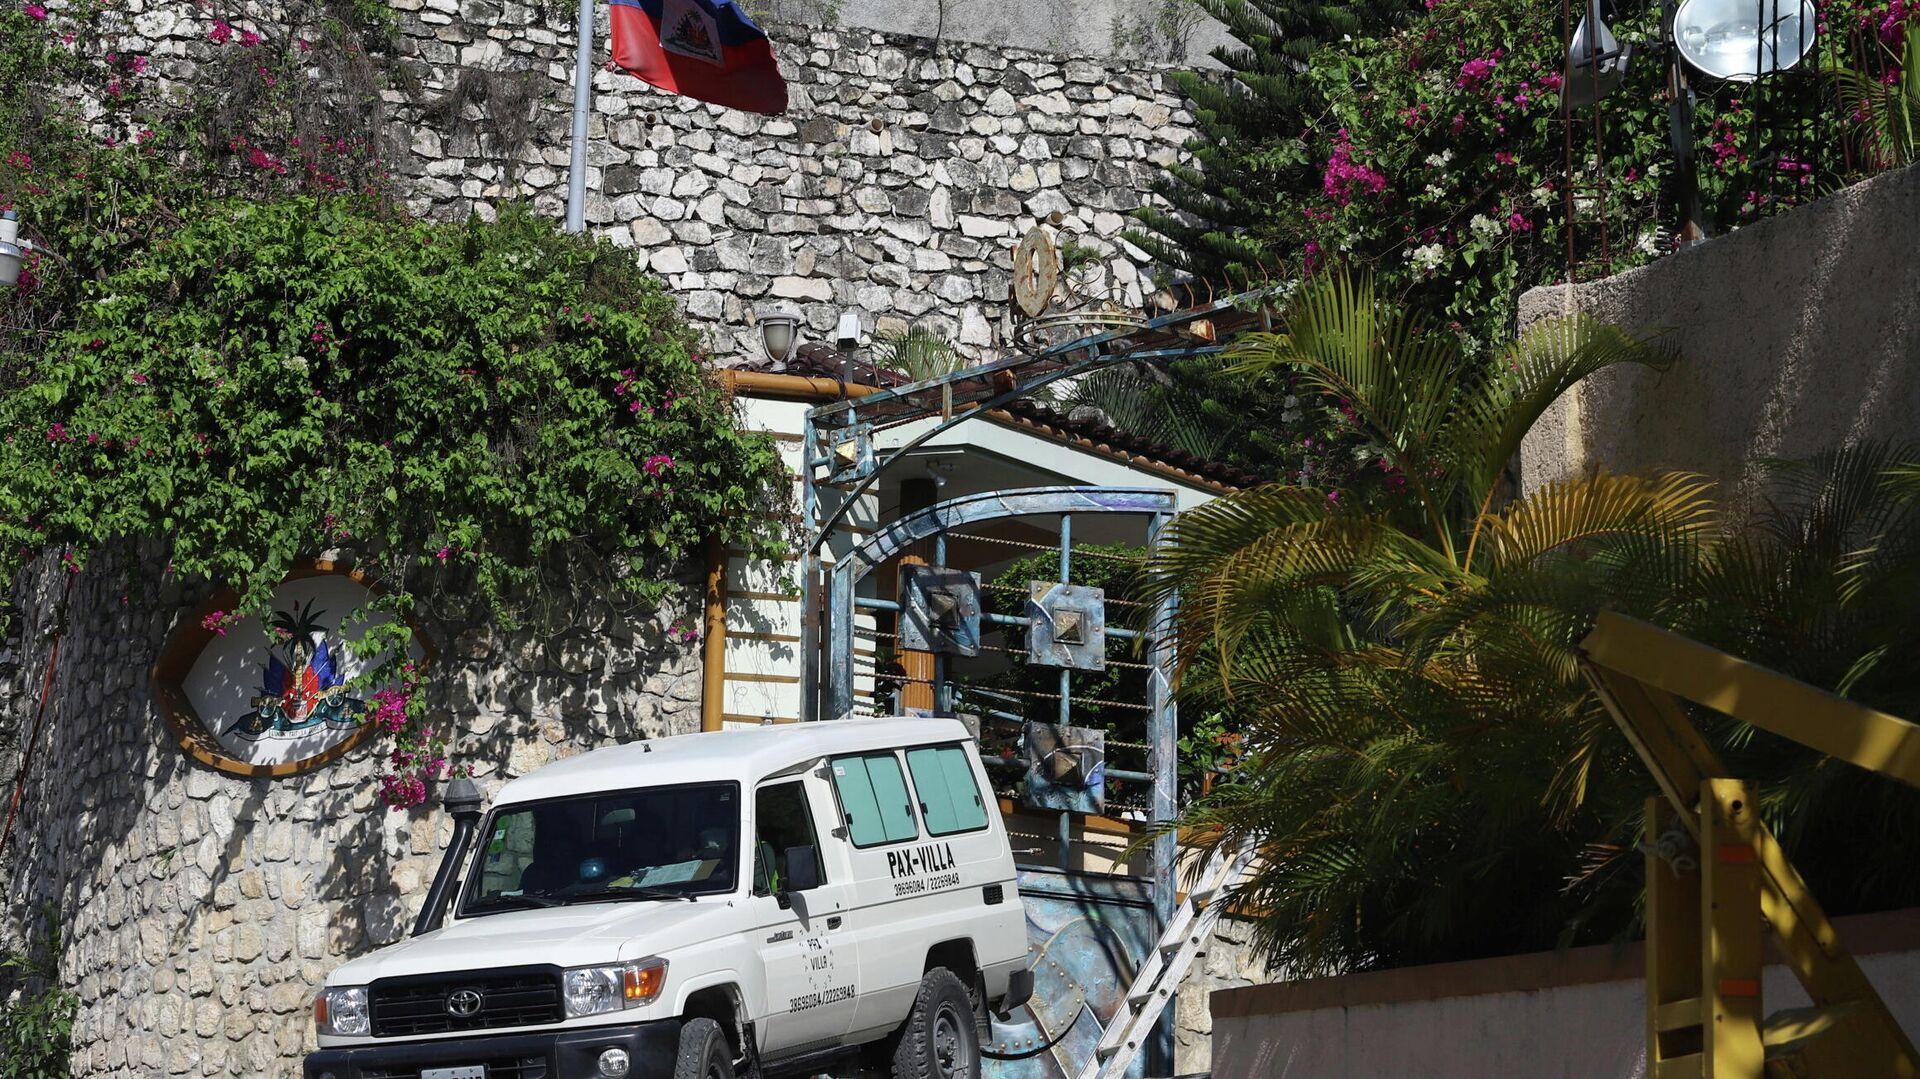 Residencia del expresidente haitiano Jovenel Moise - Sputnik Mundo, 1920, 08.07.2021